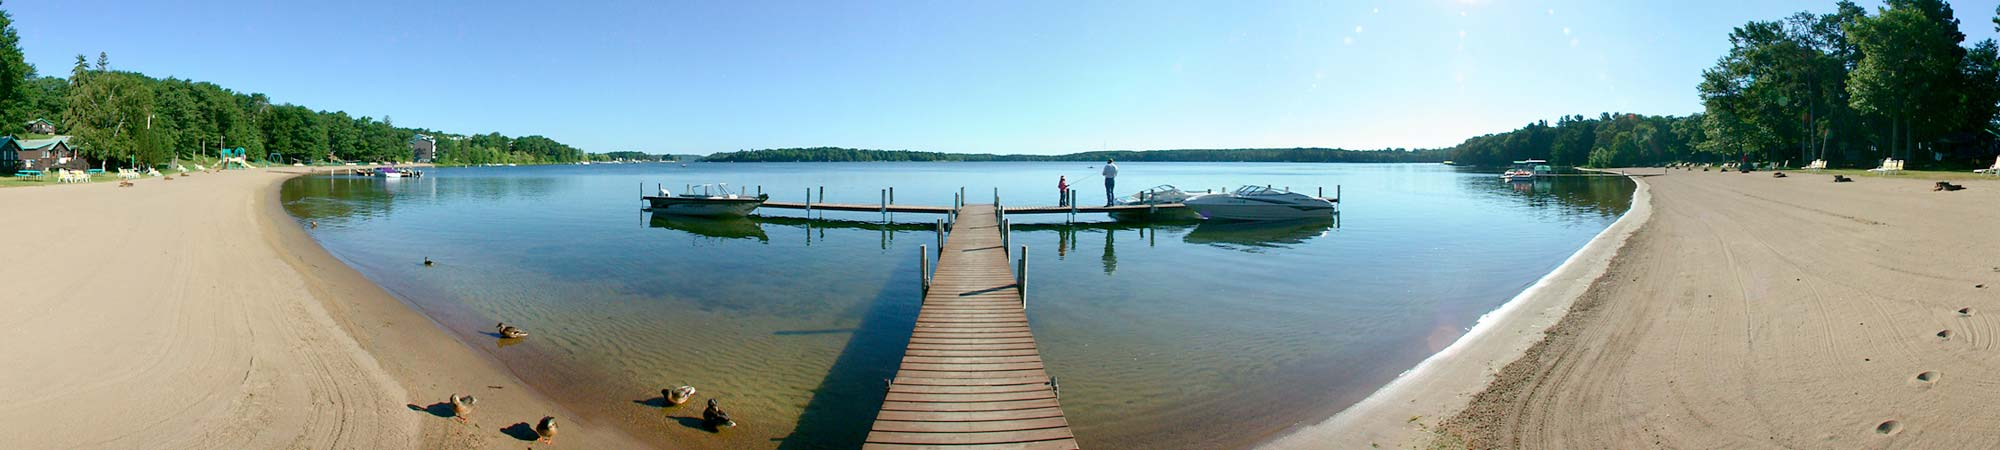 slide-lodging-Dock_fishing_2000x450